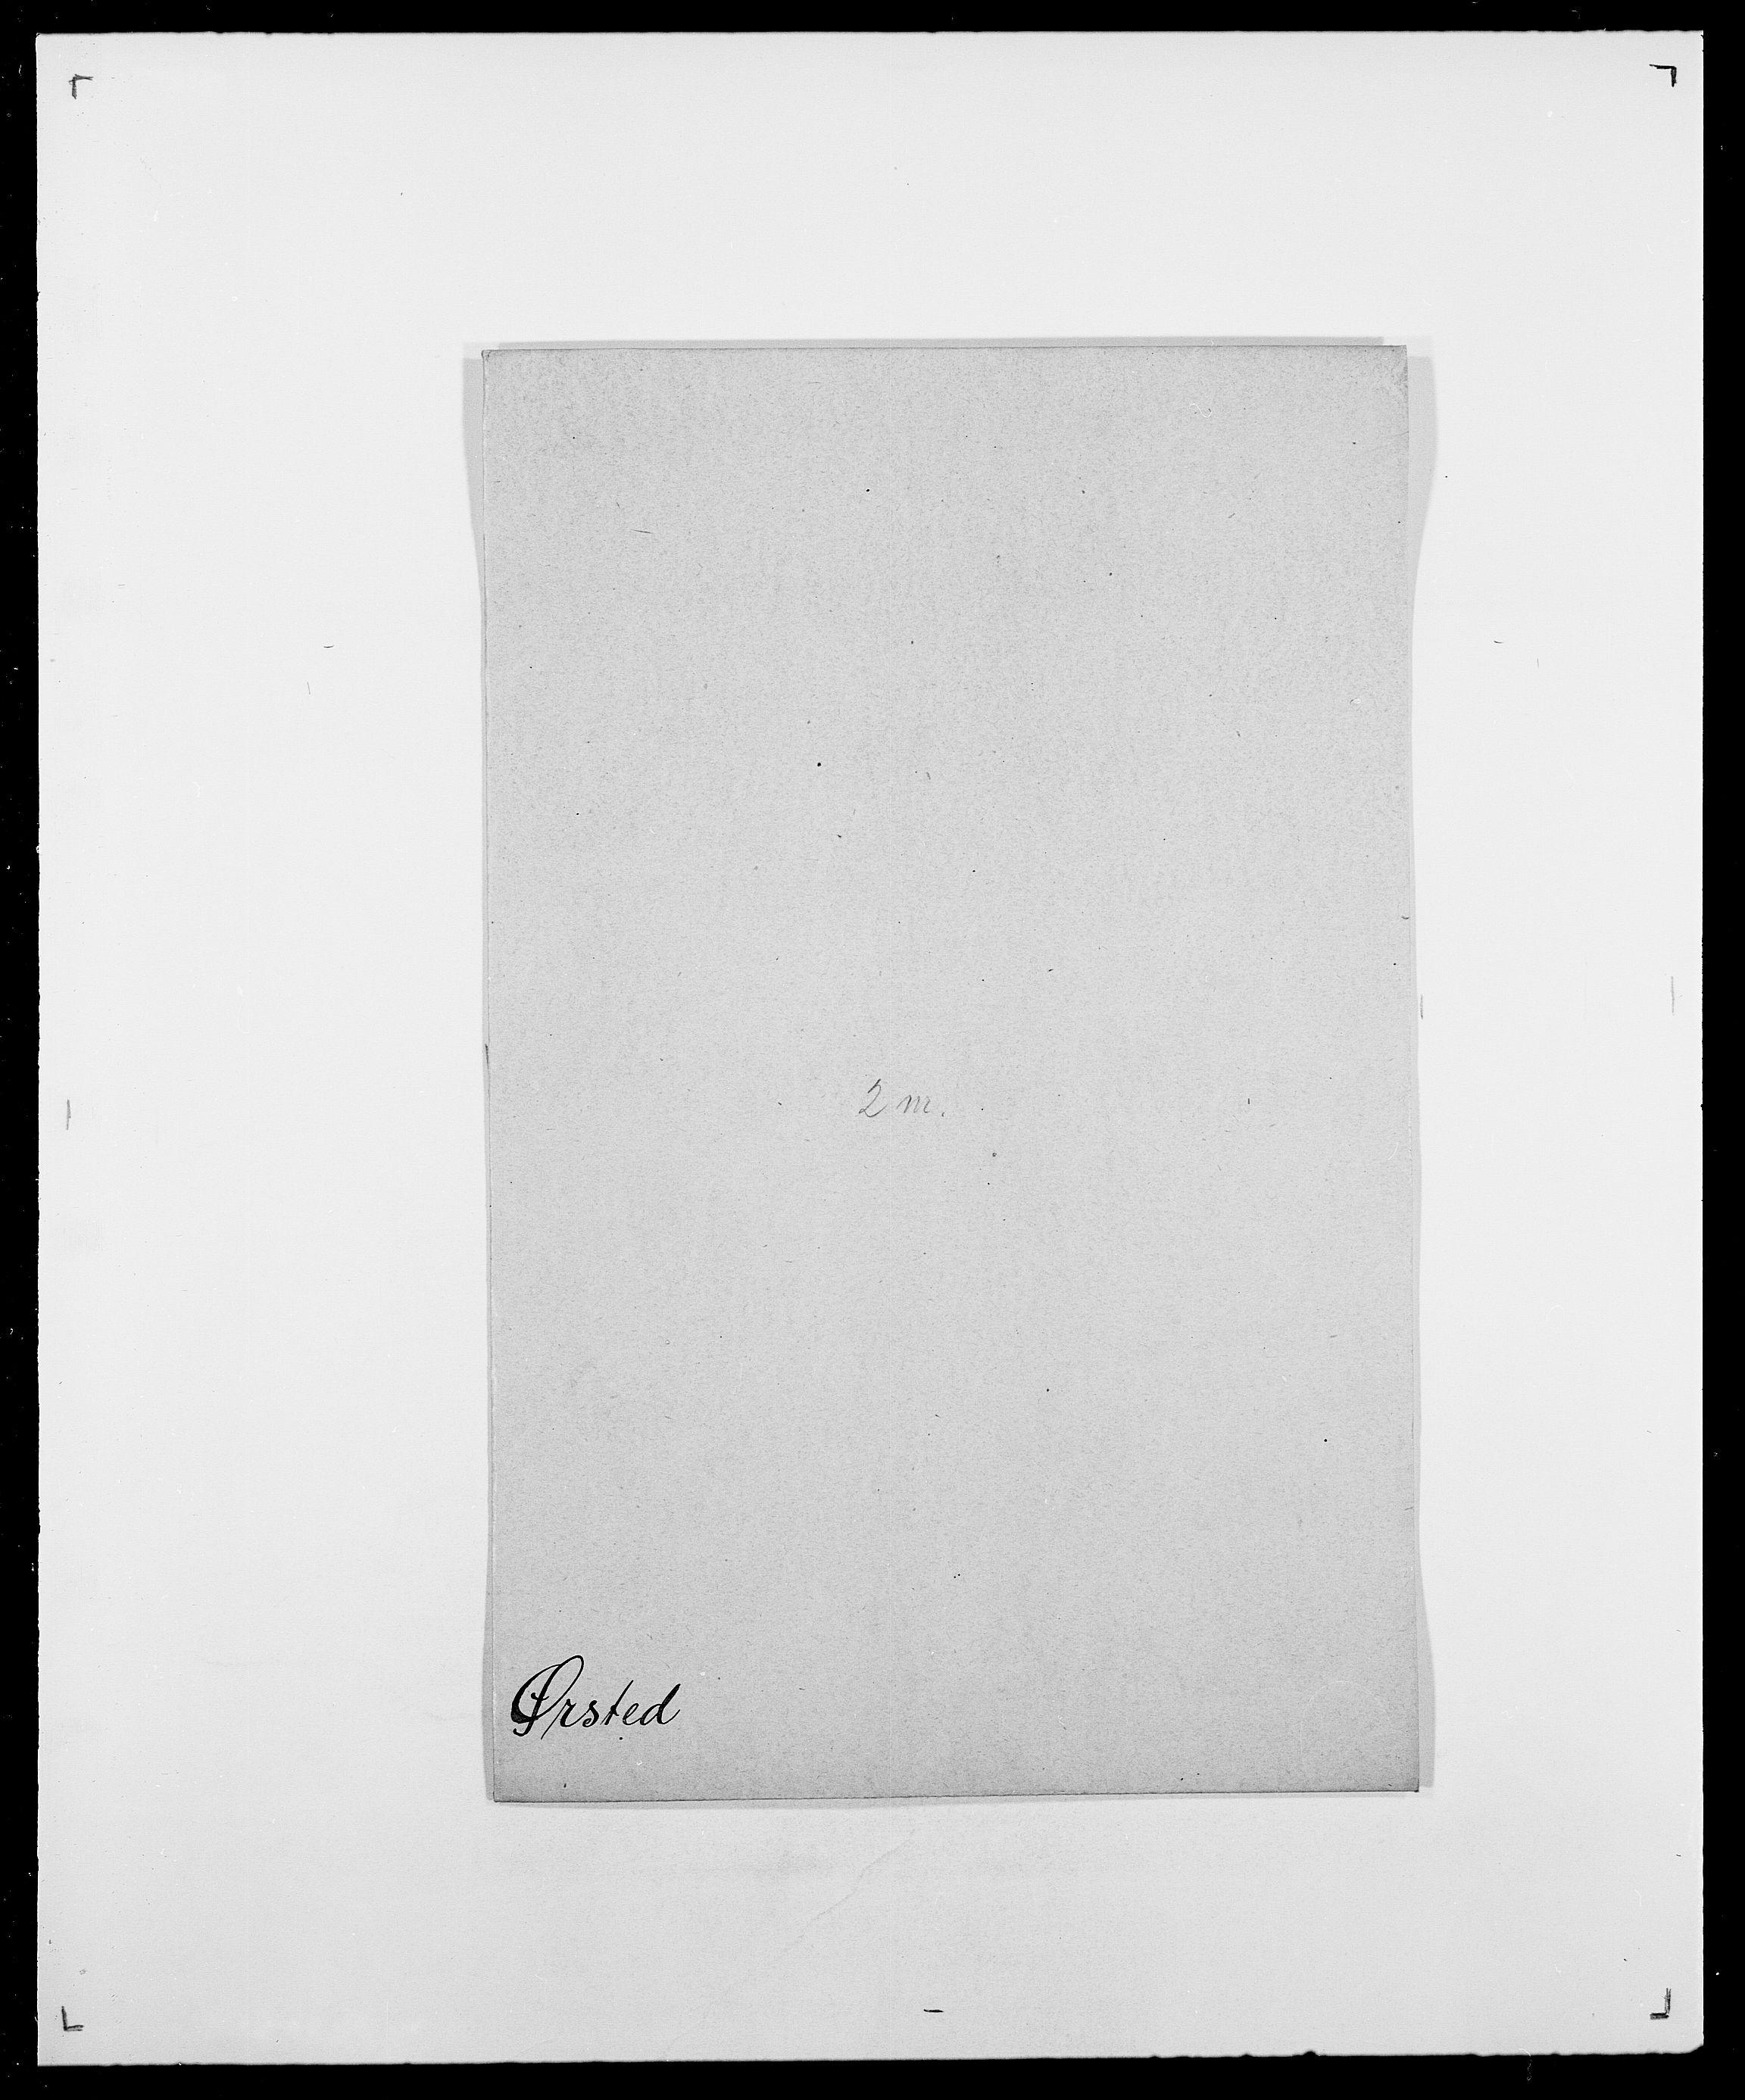 SAO, Delgobe, Charles Antoine - samling, D/Da/L0043: Wulfsberg - v. Zanten, s. 317